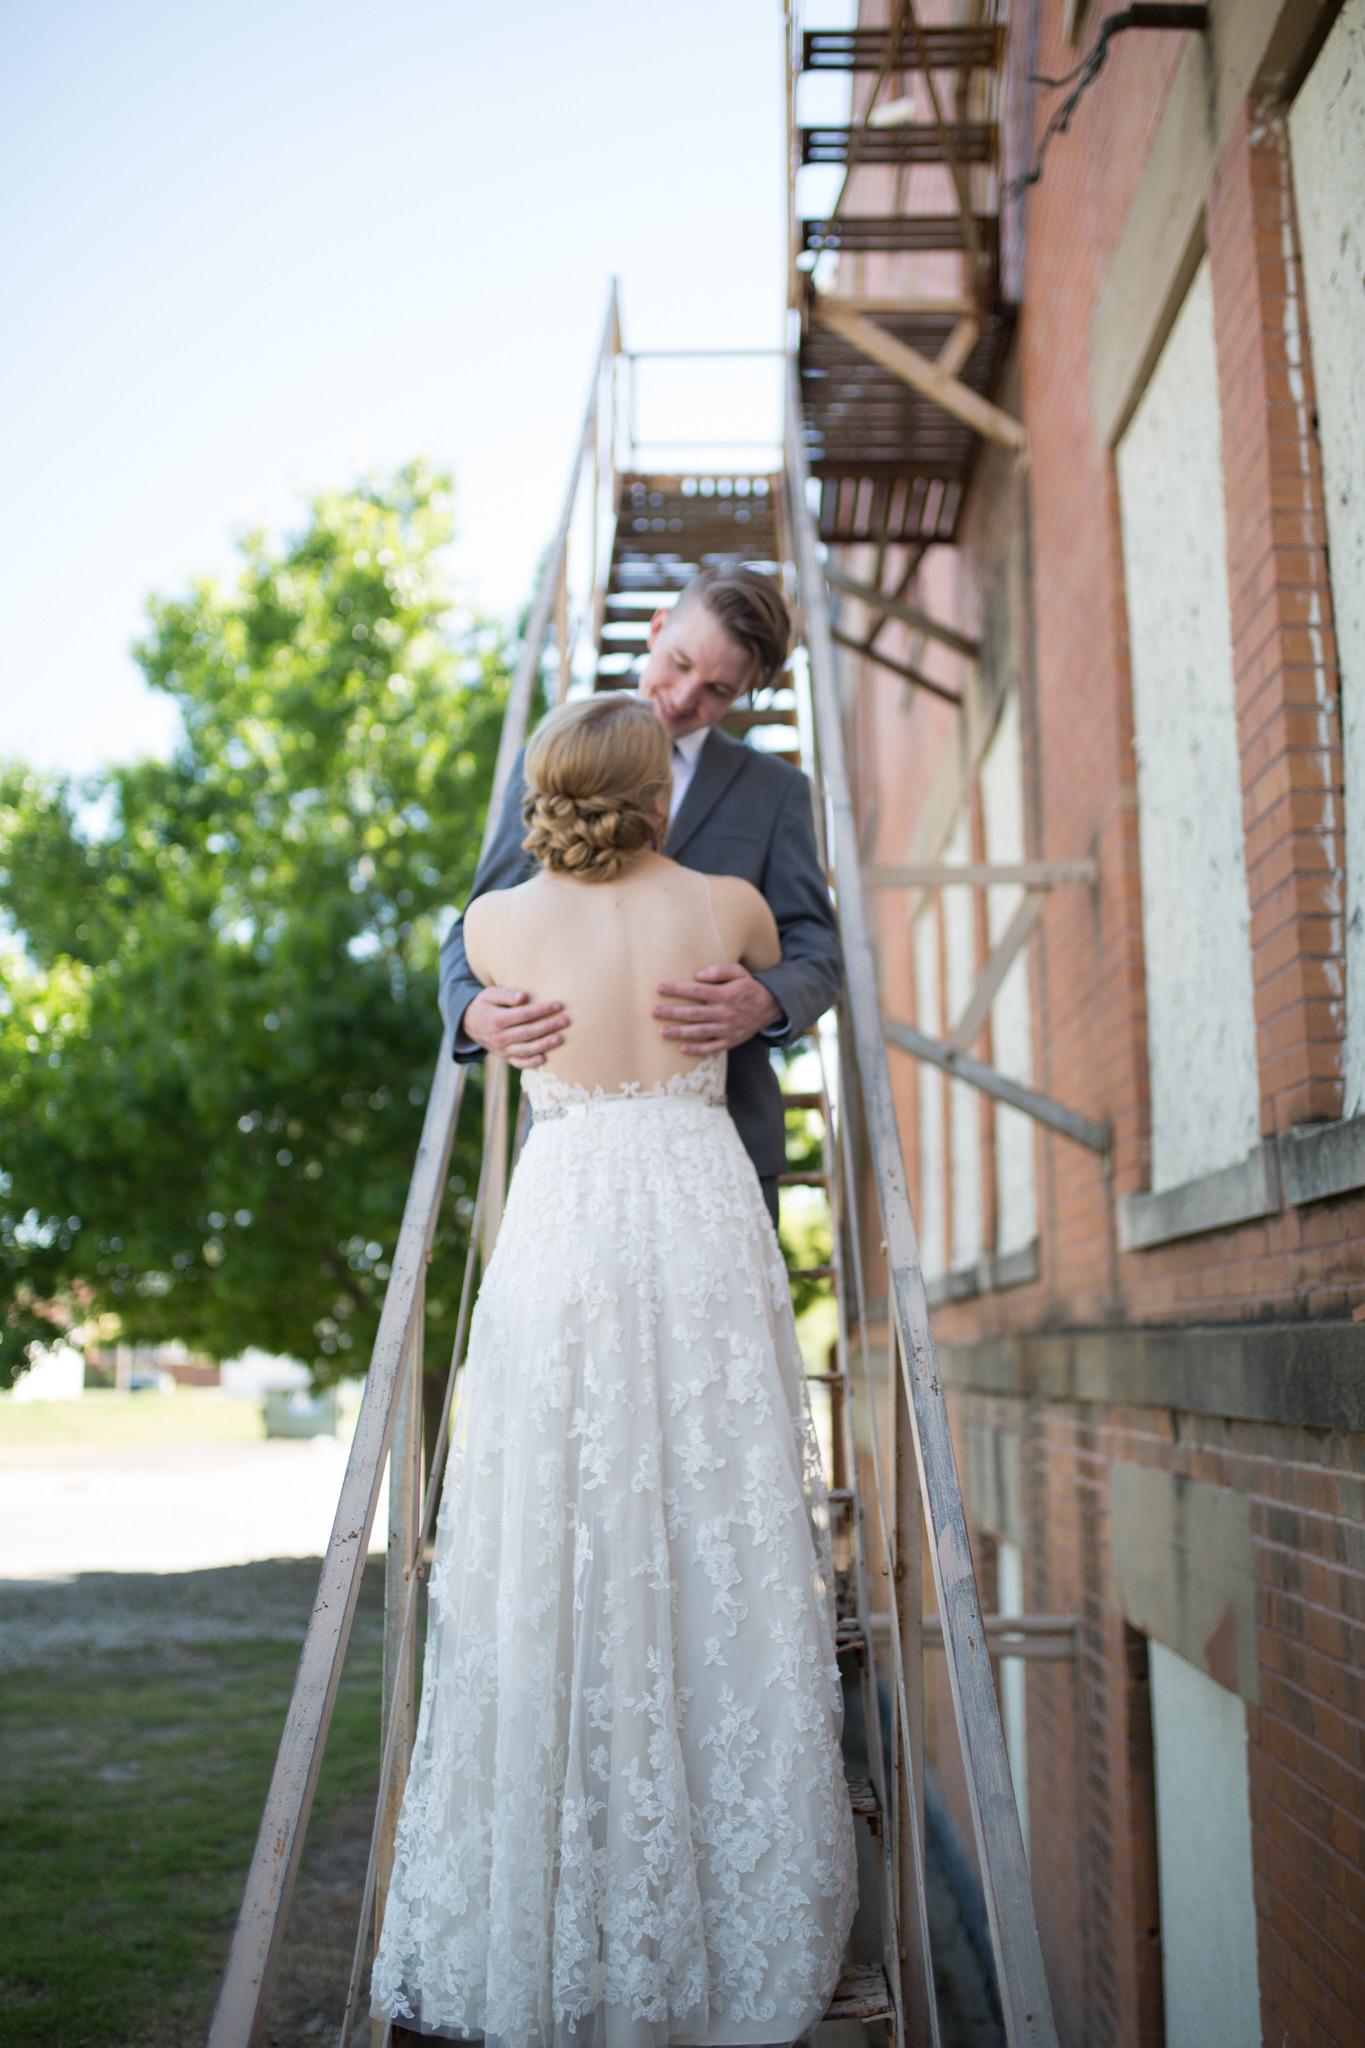 Jessica-Nat-Wedding-PhotoKumar (25 of 33).jpg